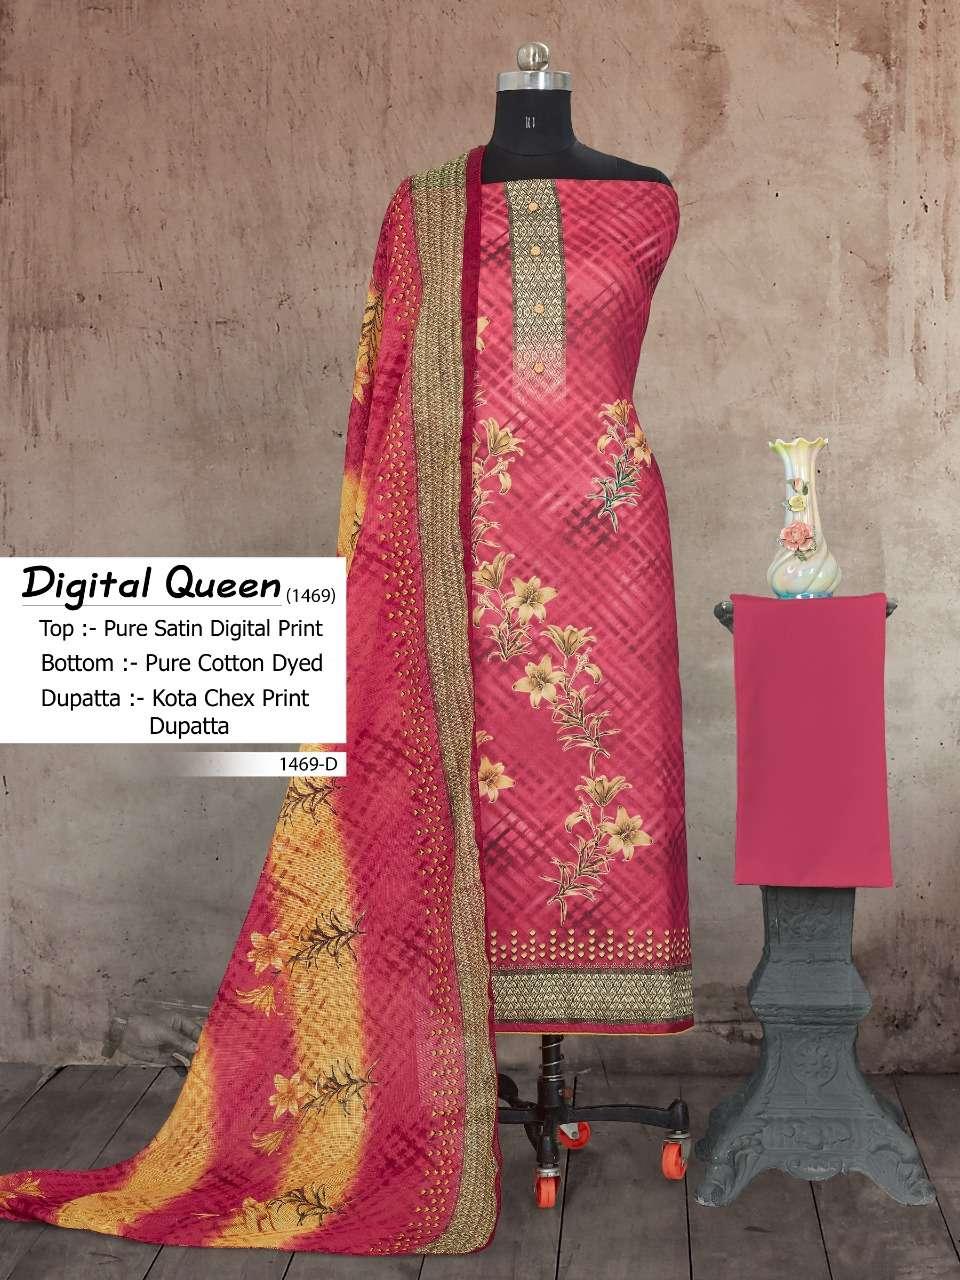 Bipson Fashion Digital Queen 1469 Cotton Satin Digital Print Dress Material Collection